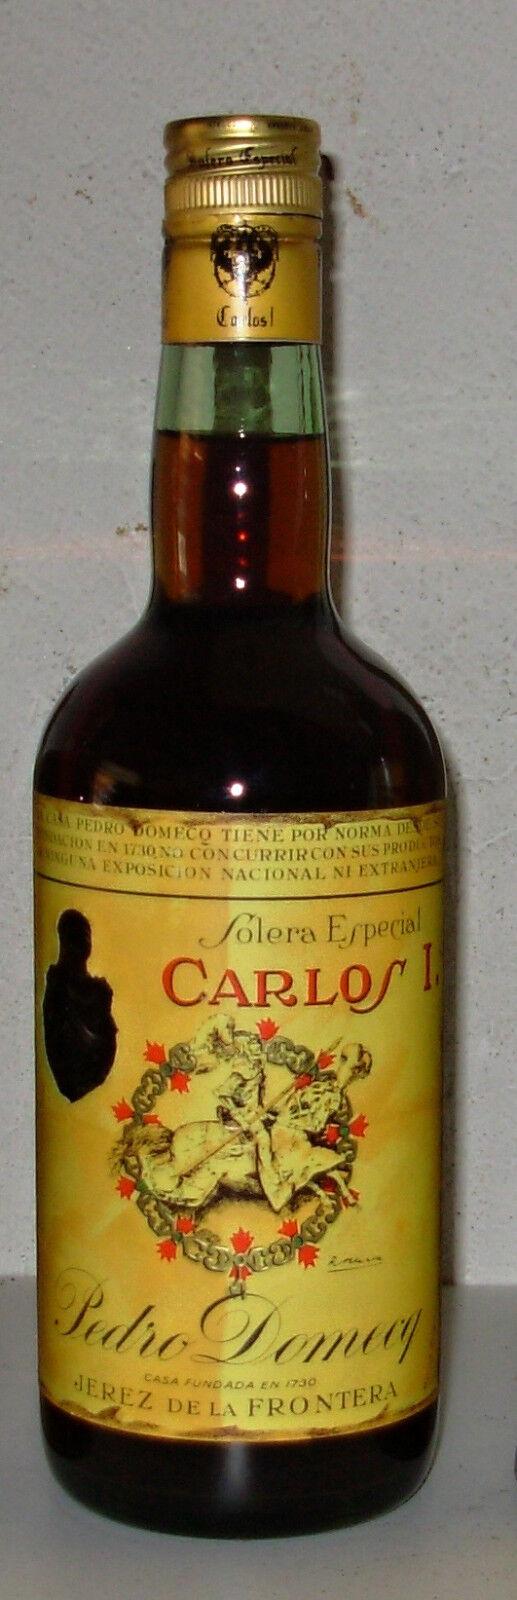 Brandy Carlos I° Pedro Domecq Solera Gran Reserva Esp 75cl 40%